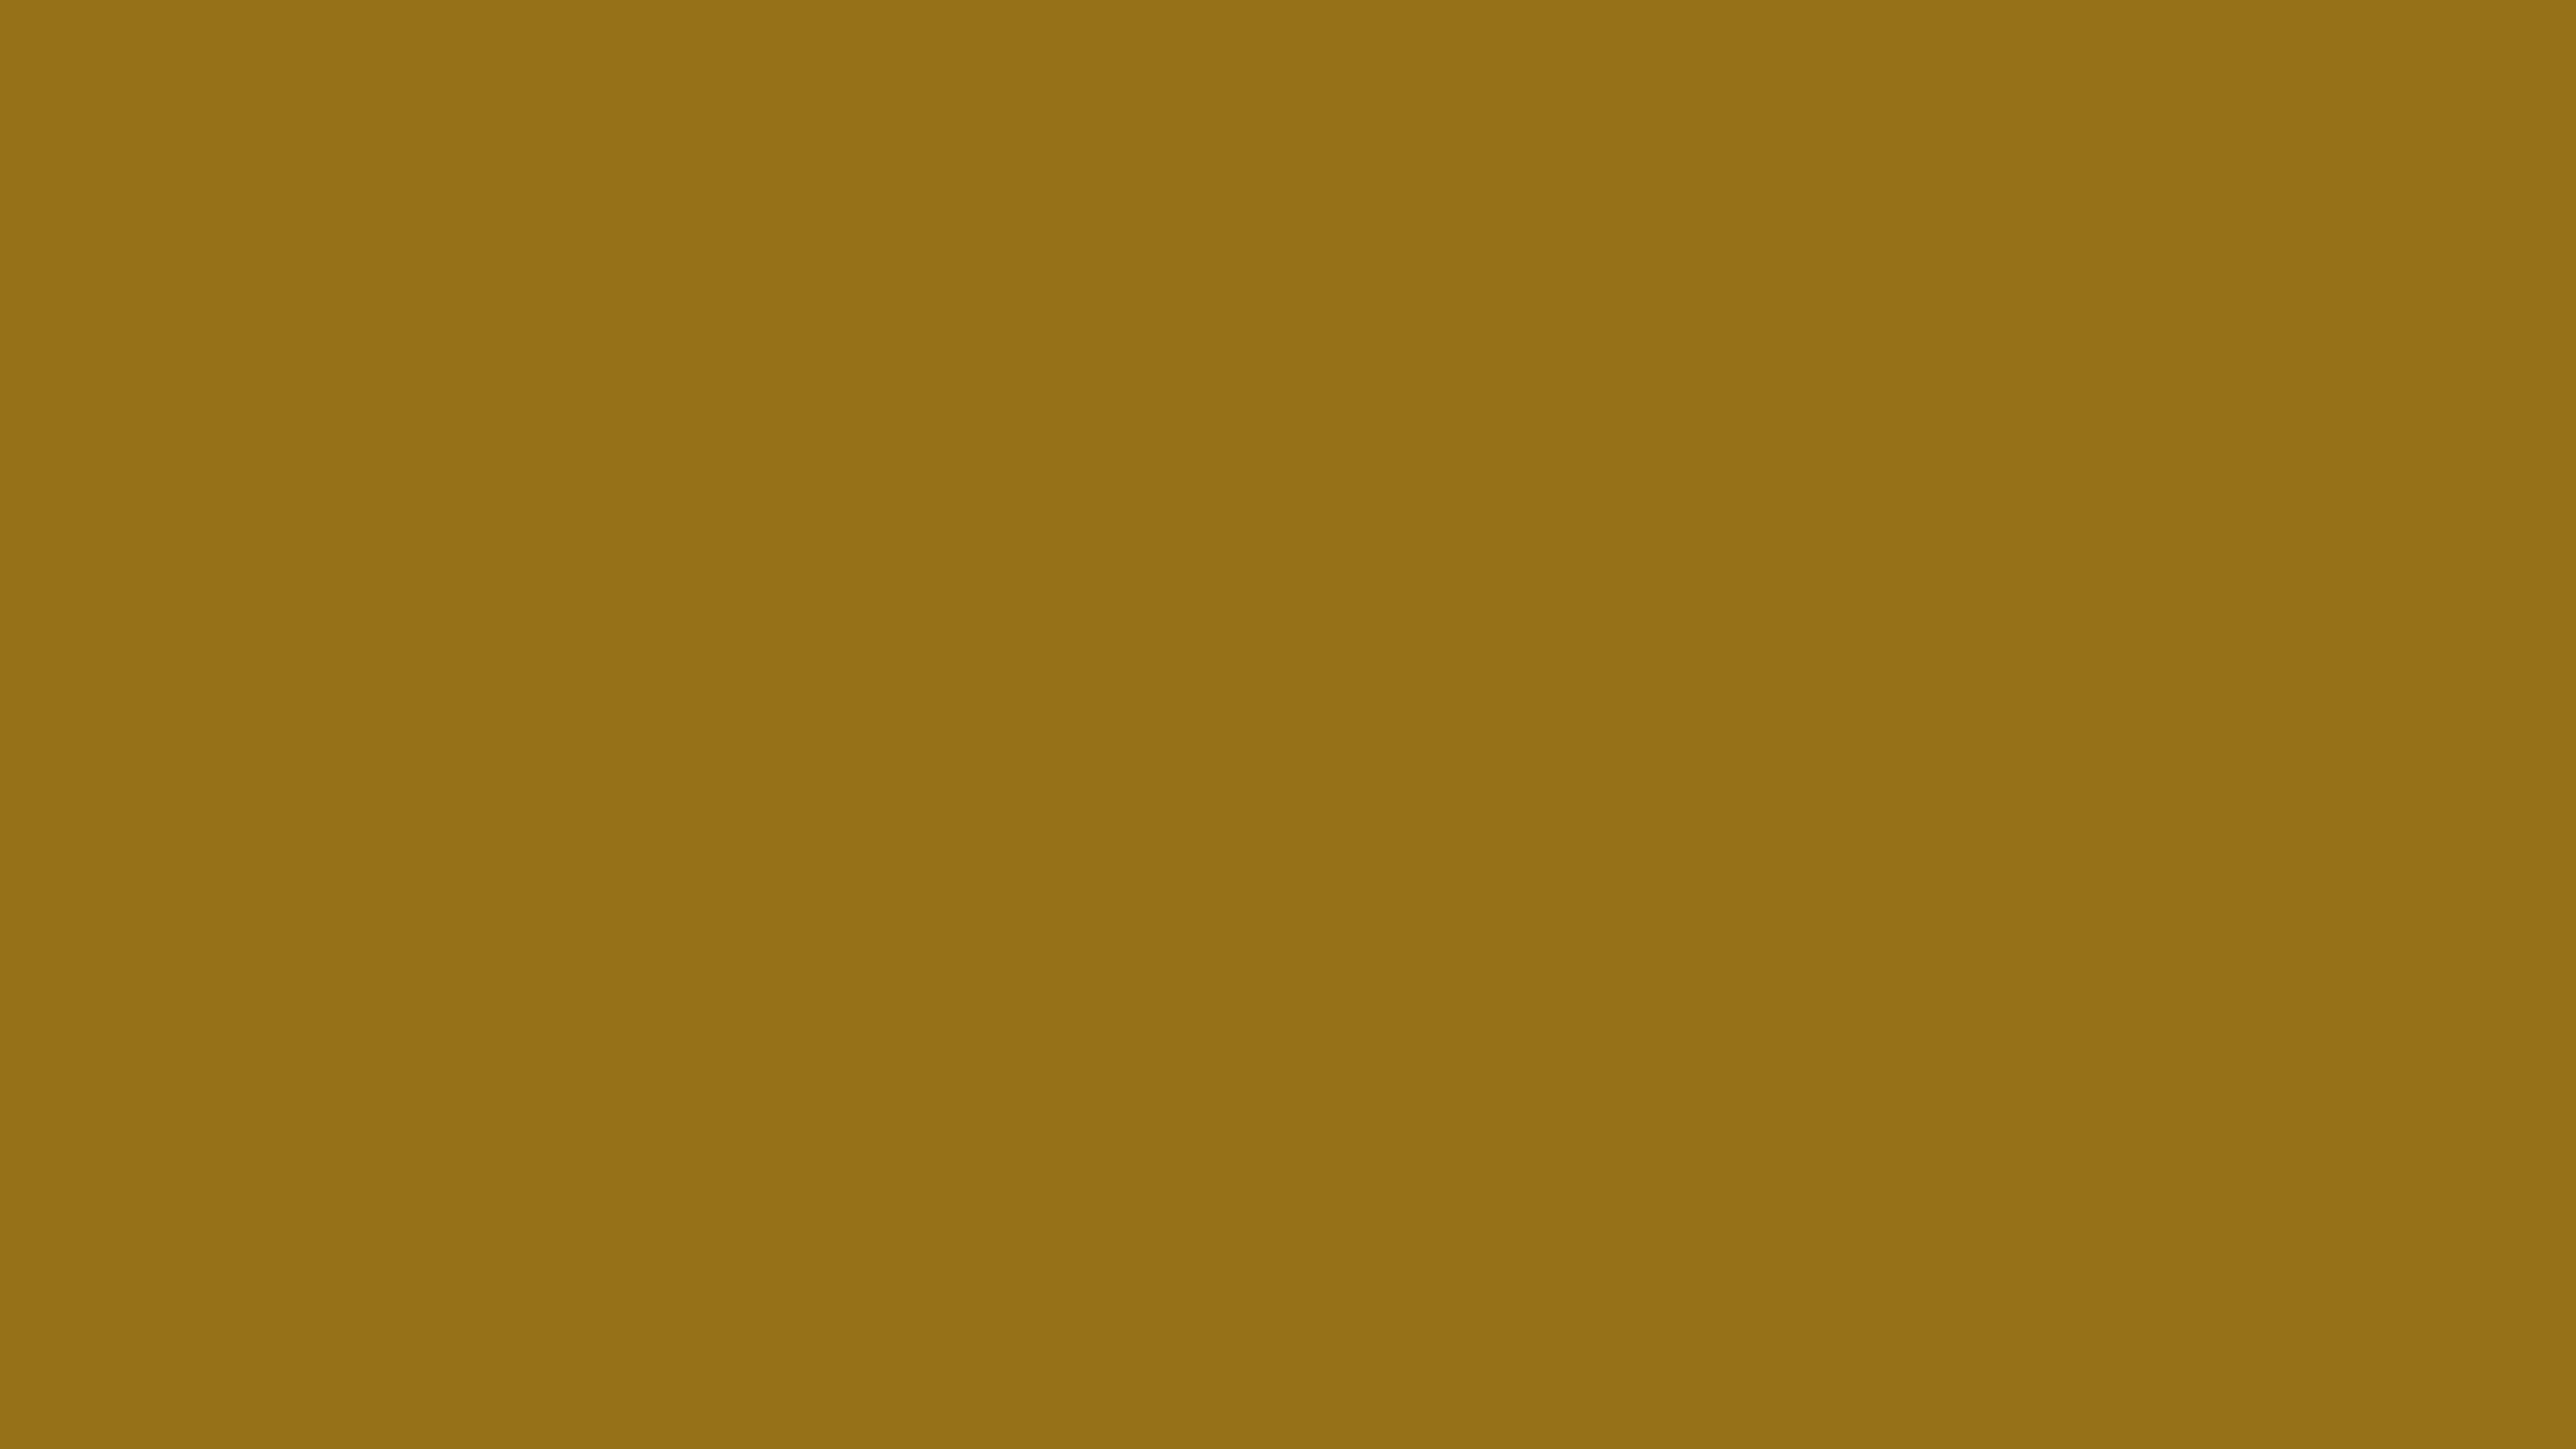 7680x4320 Bistre Brown Solid Color Background